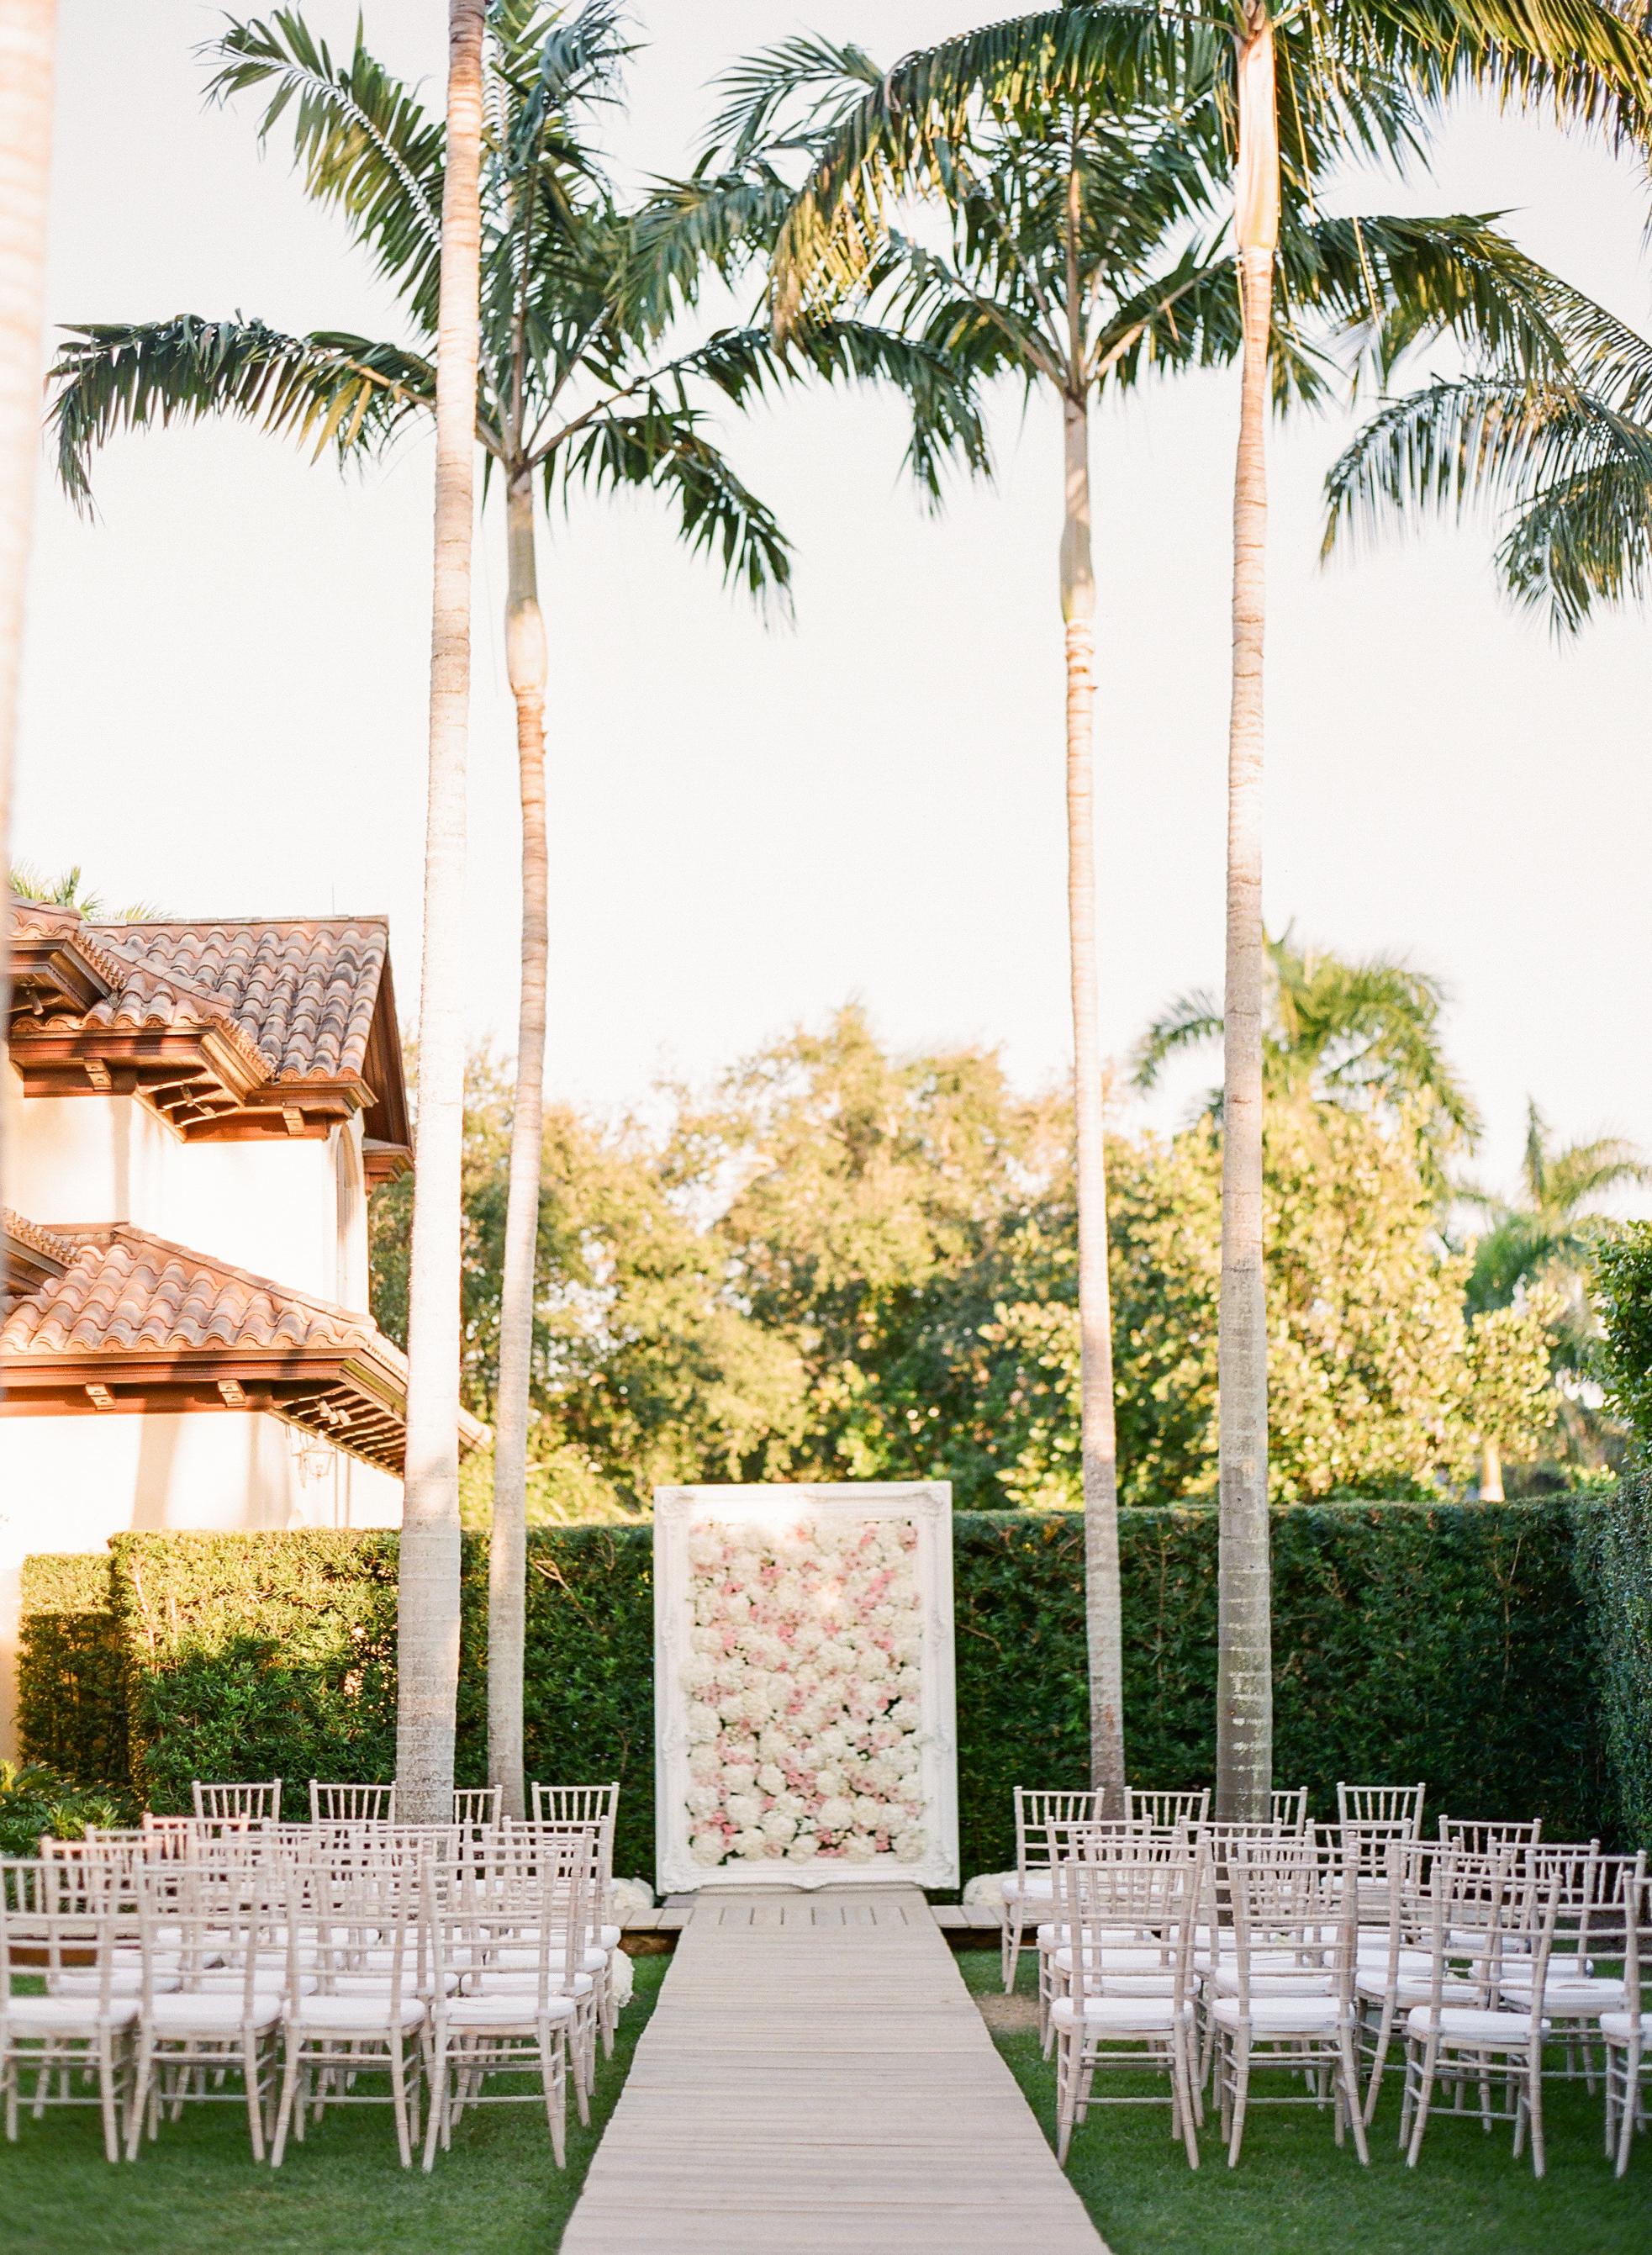 Ceci_New_York_Florida_Wedding_Style_Bride_Watercolor_Real_Custom_Luxury_57.jpg